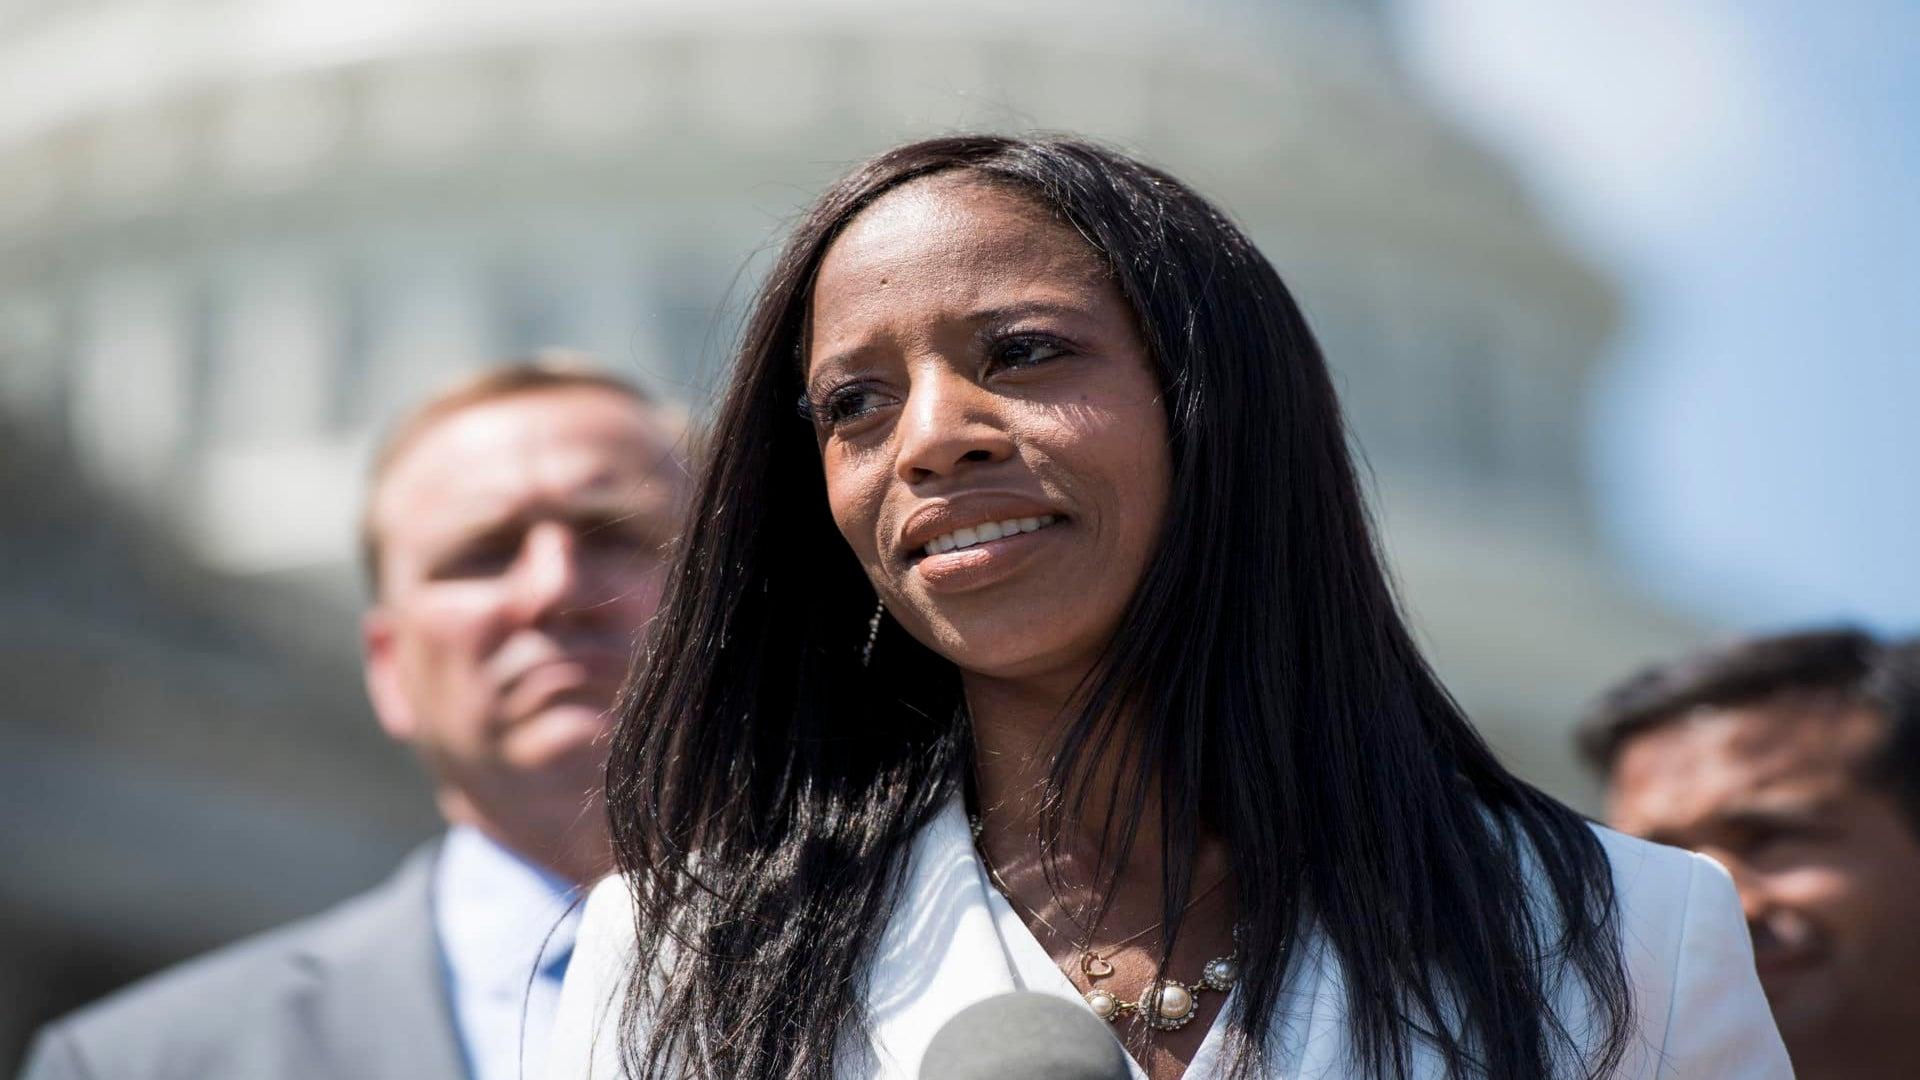 Rep. Mia Love, Republican Candidate For Utah's 4th Congressional District